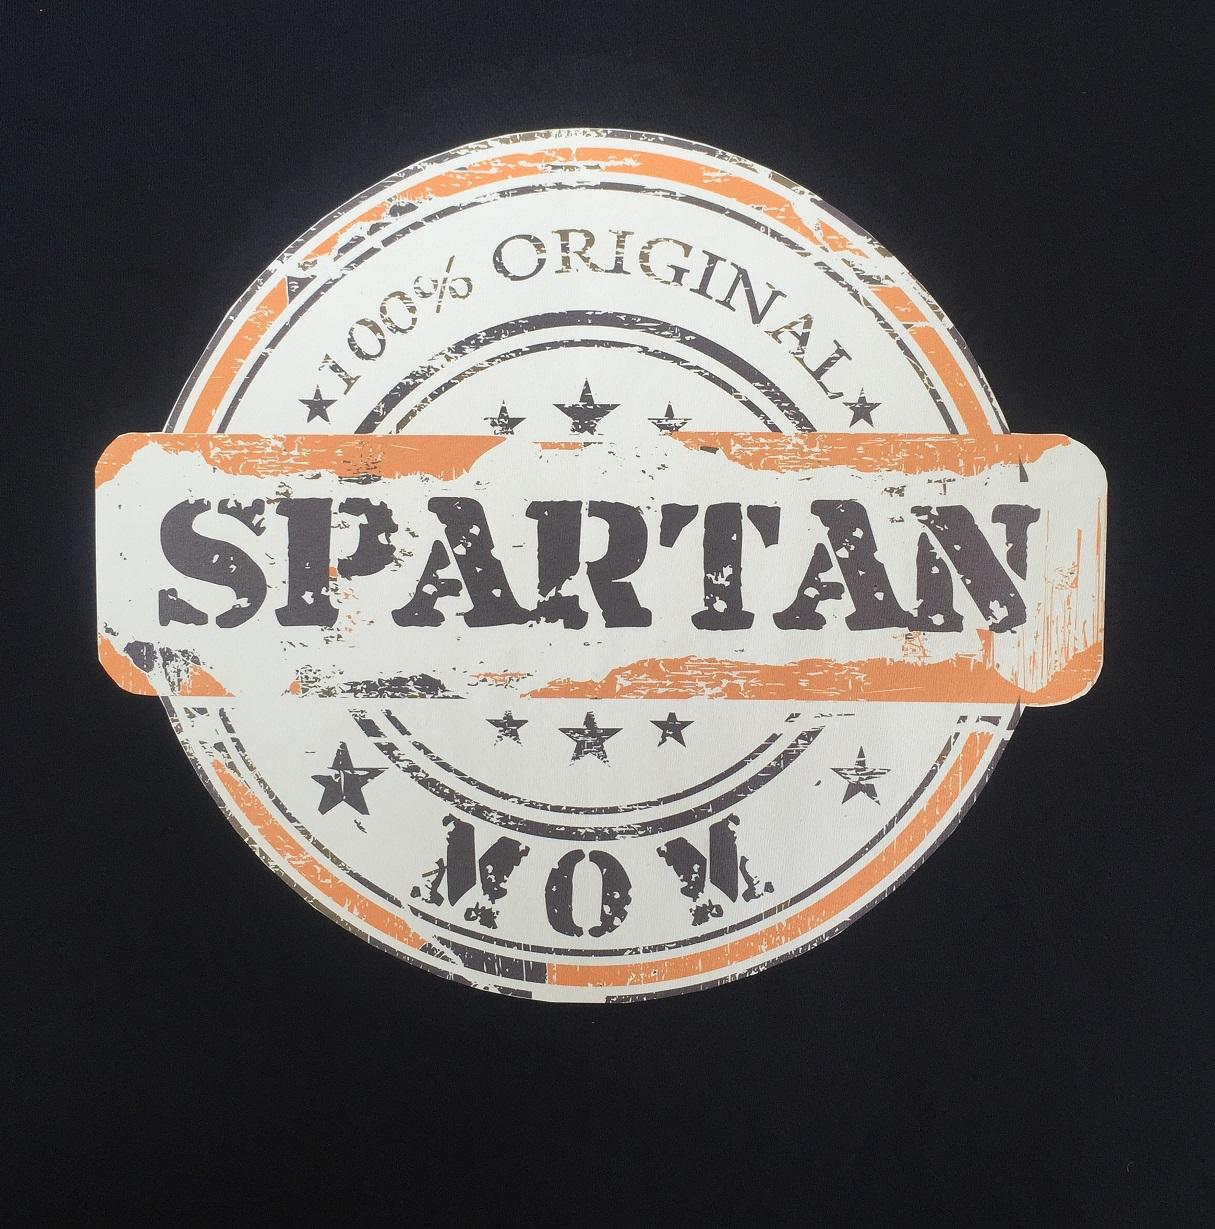 waynesville-ohio-spartan-mom-shirts